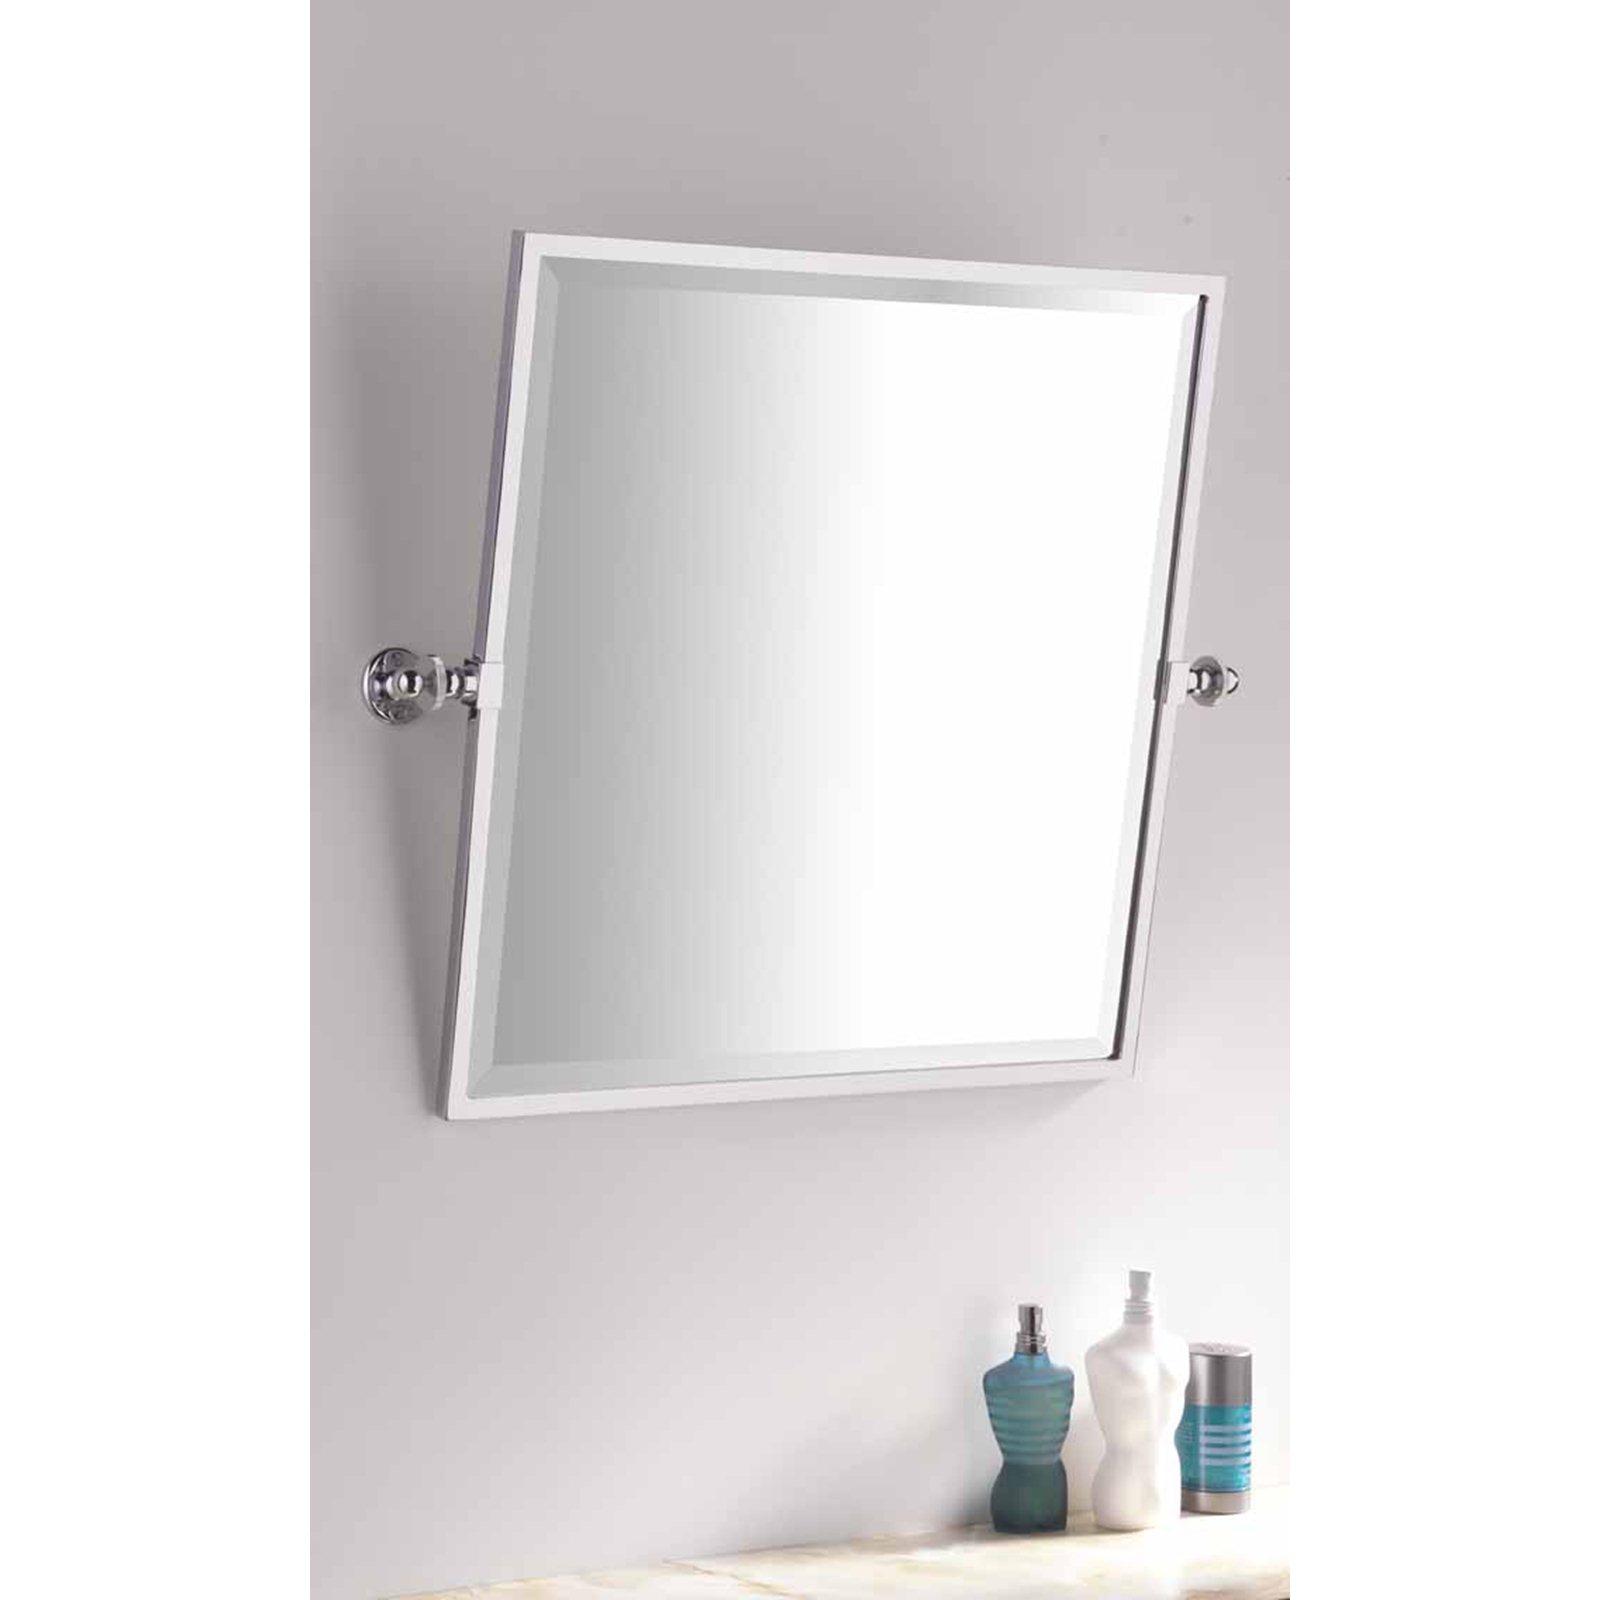 Bathroom Square Framed Tilting Mirror